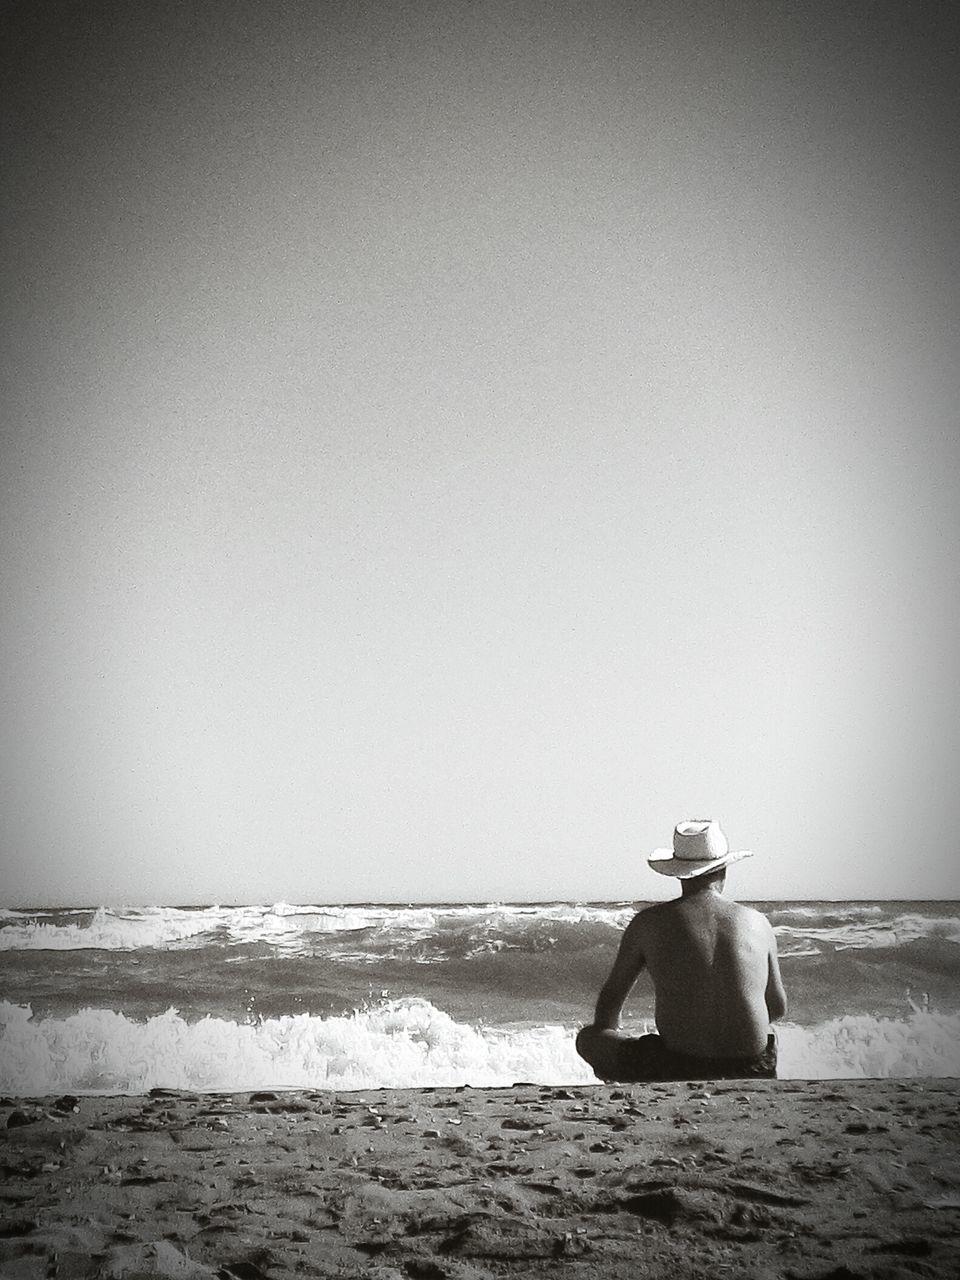 Tourist Sitting On Beach